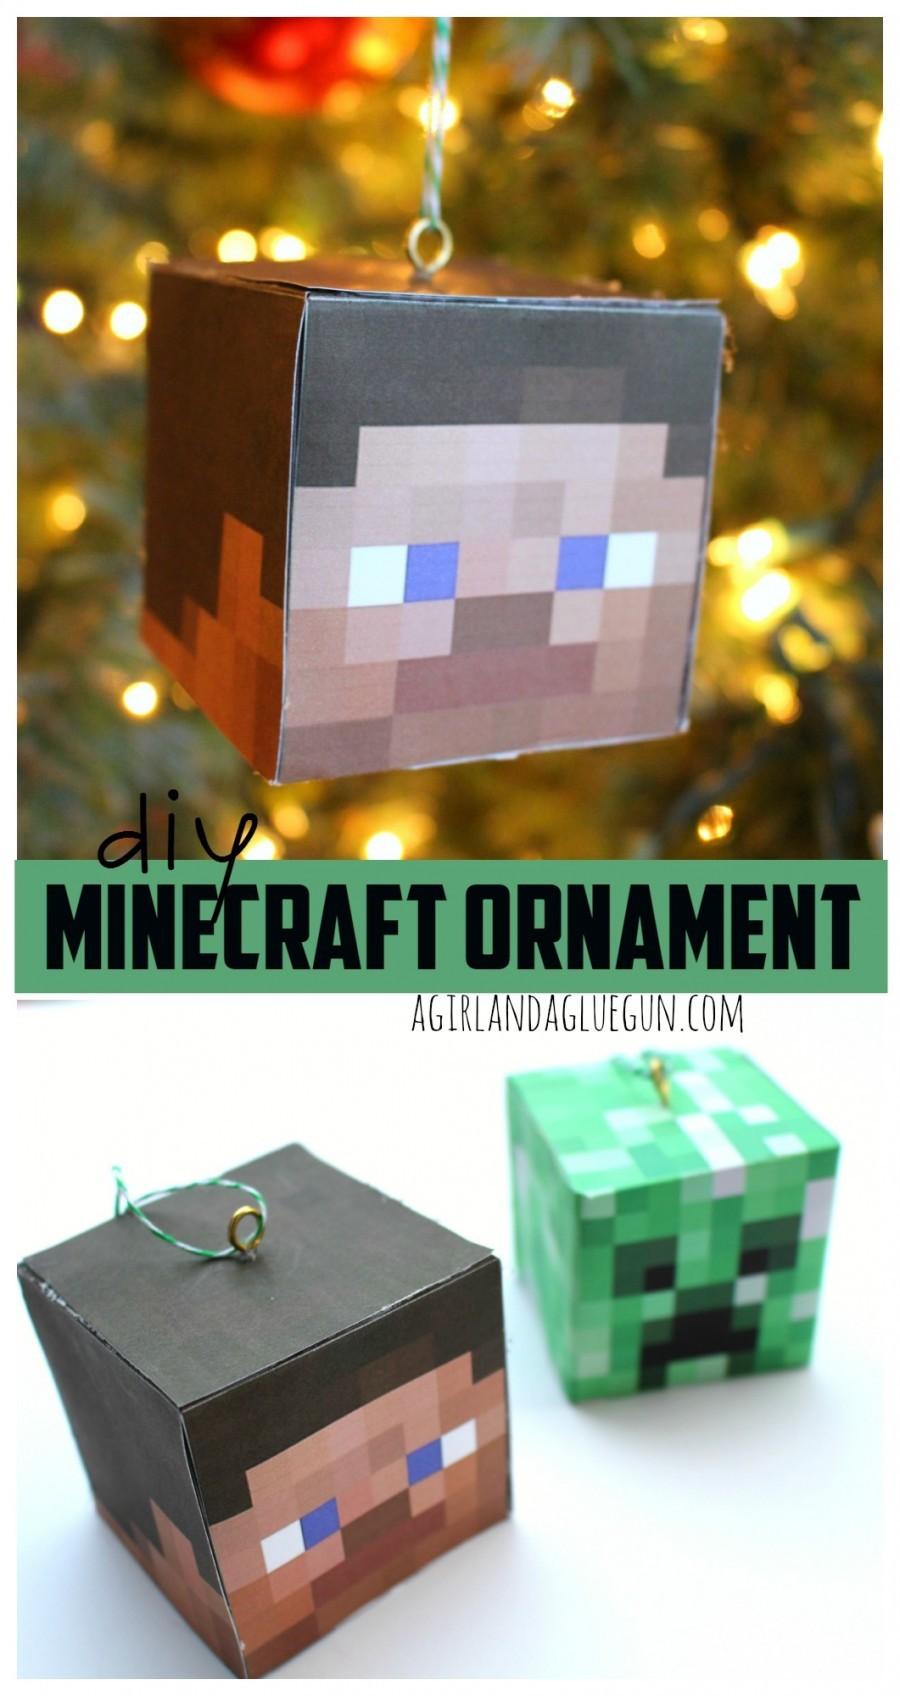 Diy minecraft ornament for Minecraft crafts for kids